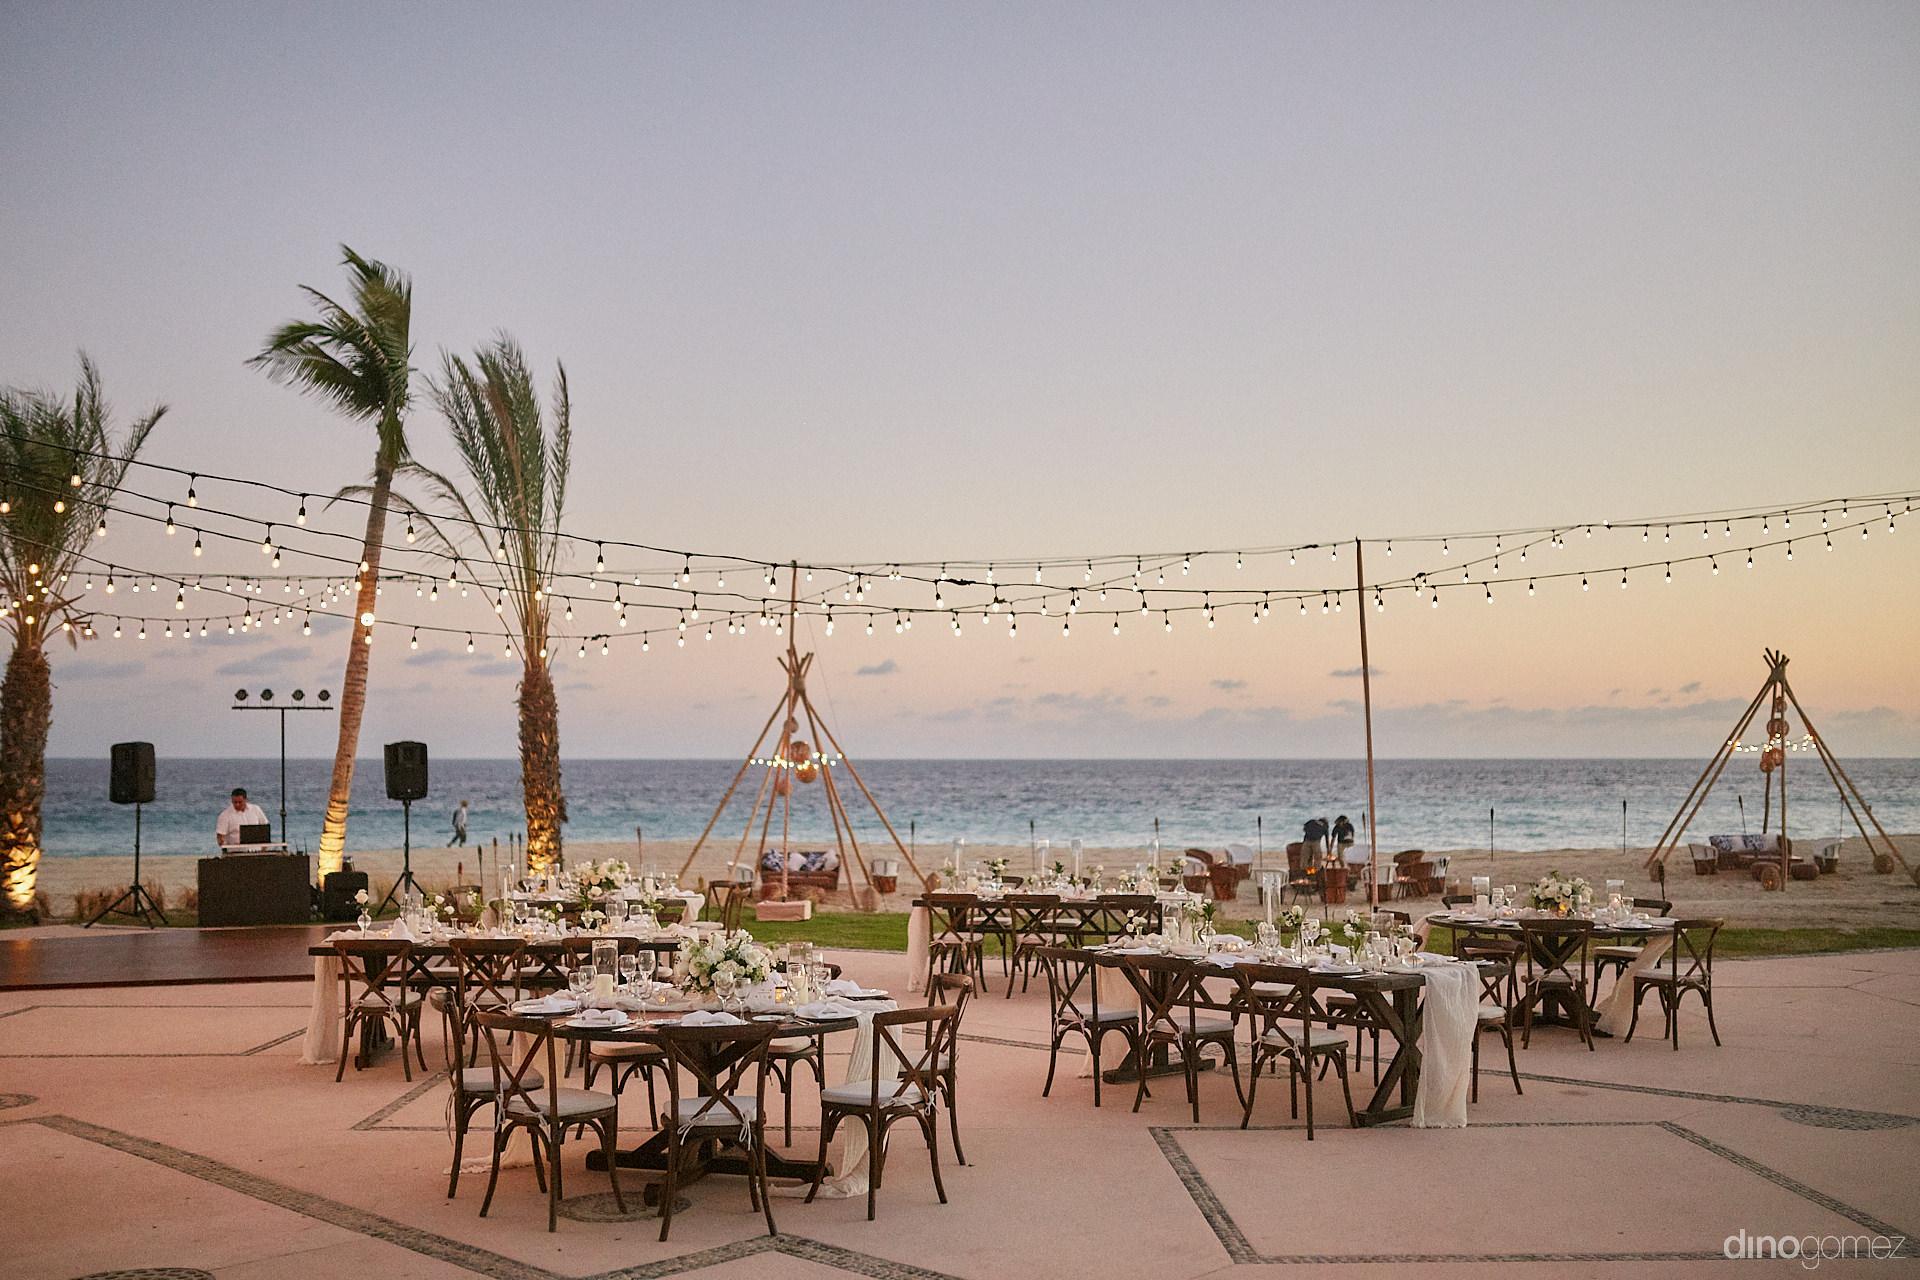 Cabo San Lucas Destination Wedding - Luxury Wedding Photographer In Cabo Dino Gomez - C&T